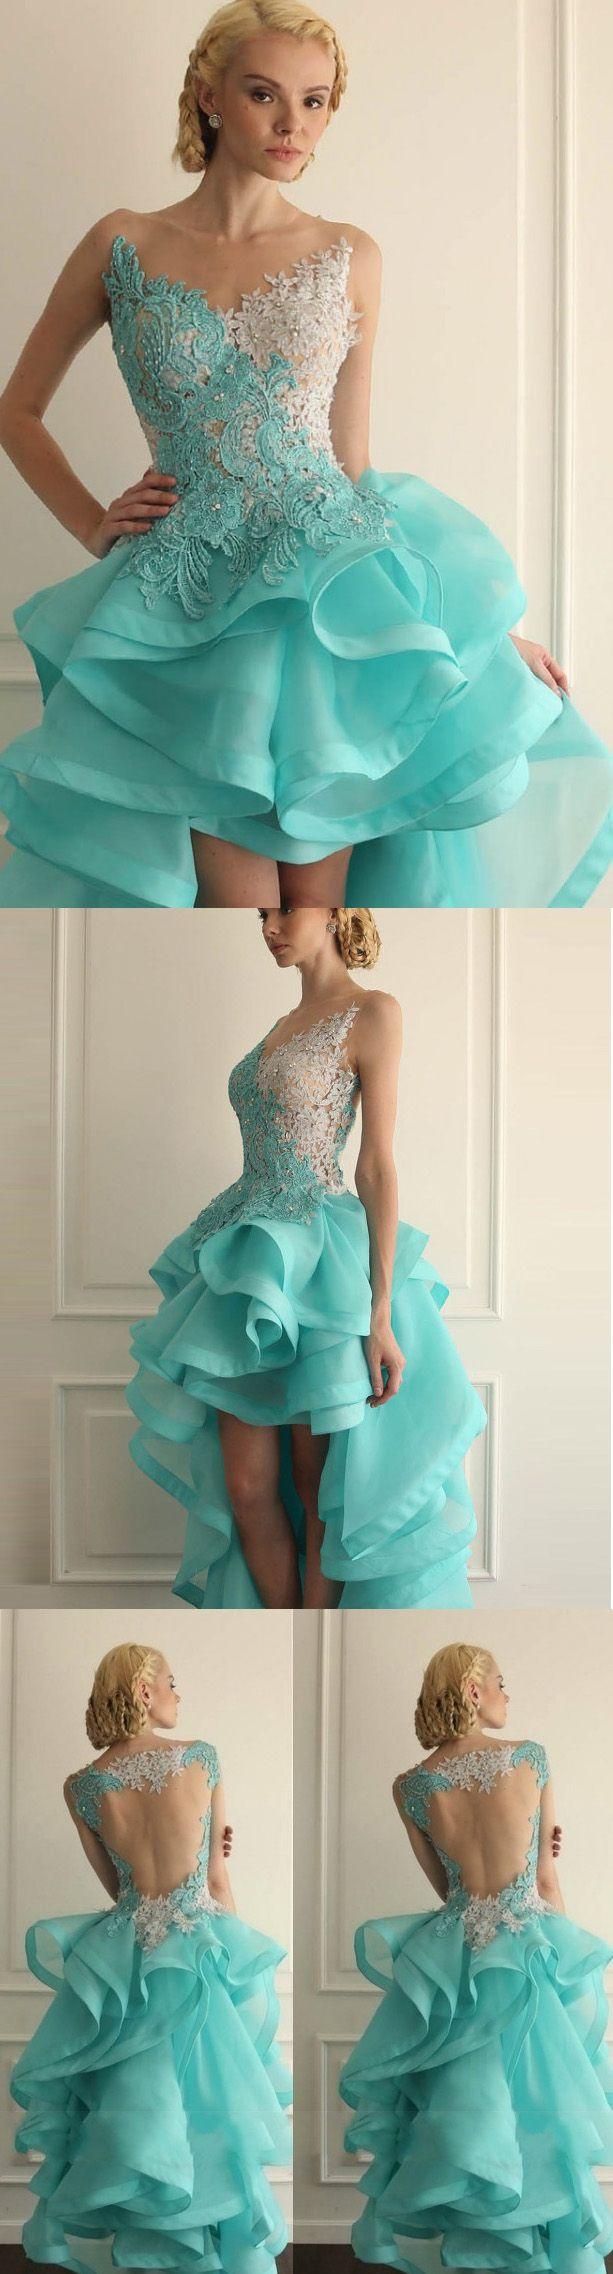 89 best Short Prom Dresses images on Pinterest | Princess prom ...